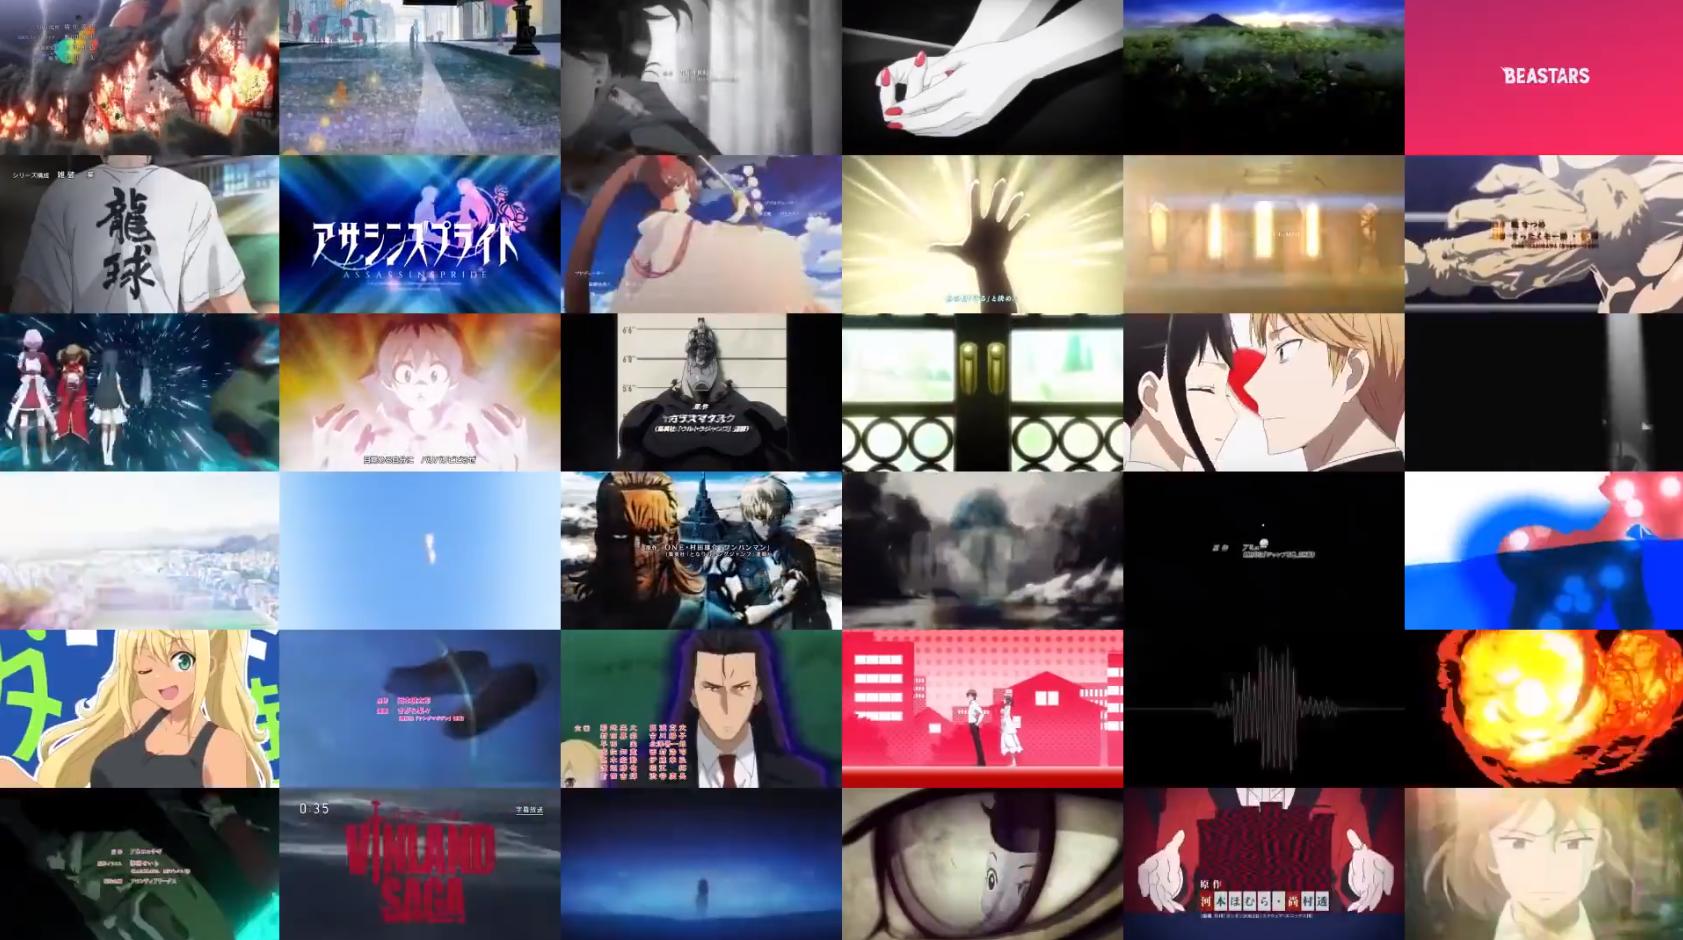 Anime in 2019 2019年的日本动画 gigguk ACG资讯